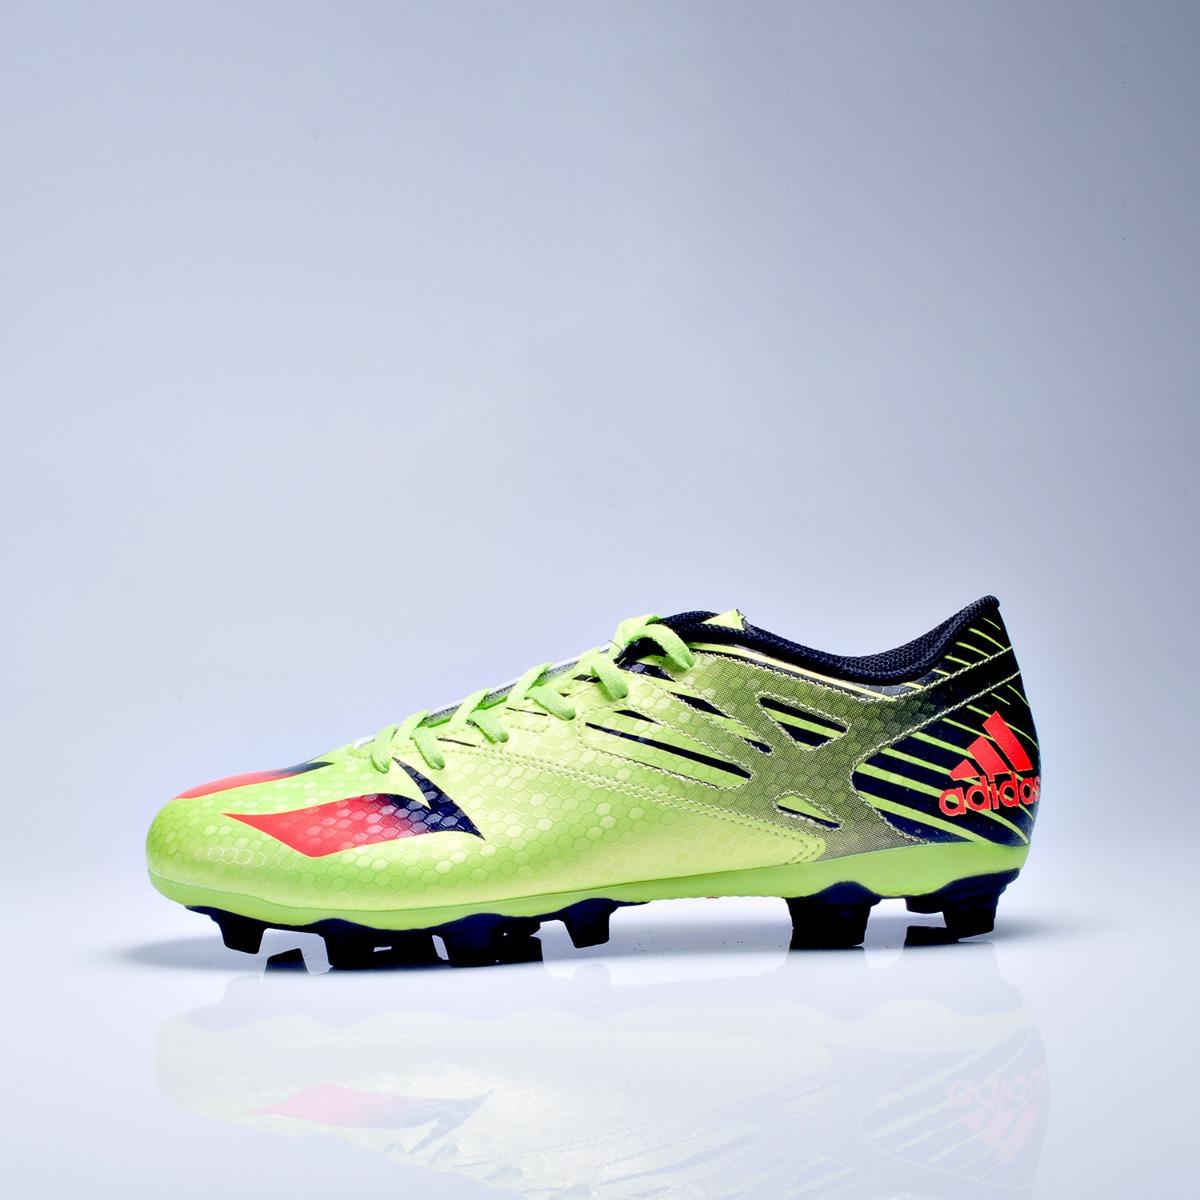 494021825 Botines adidas Messi 15.4 Fxg-s74698- adidas Performance -   799